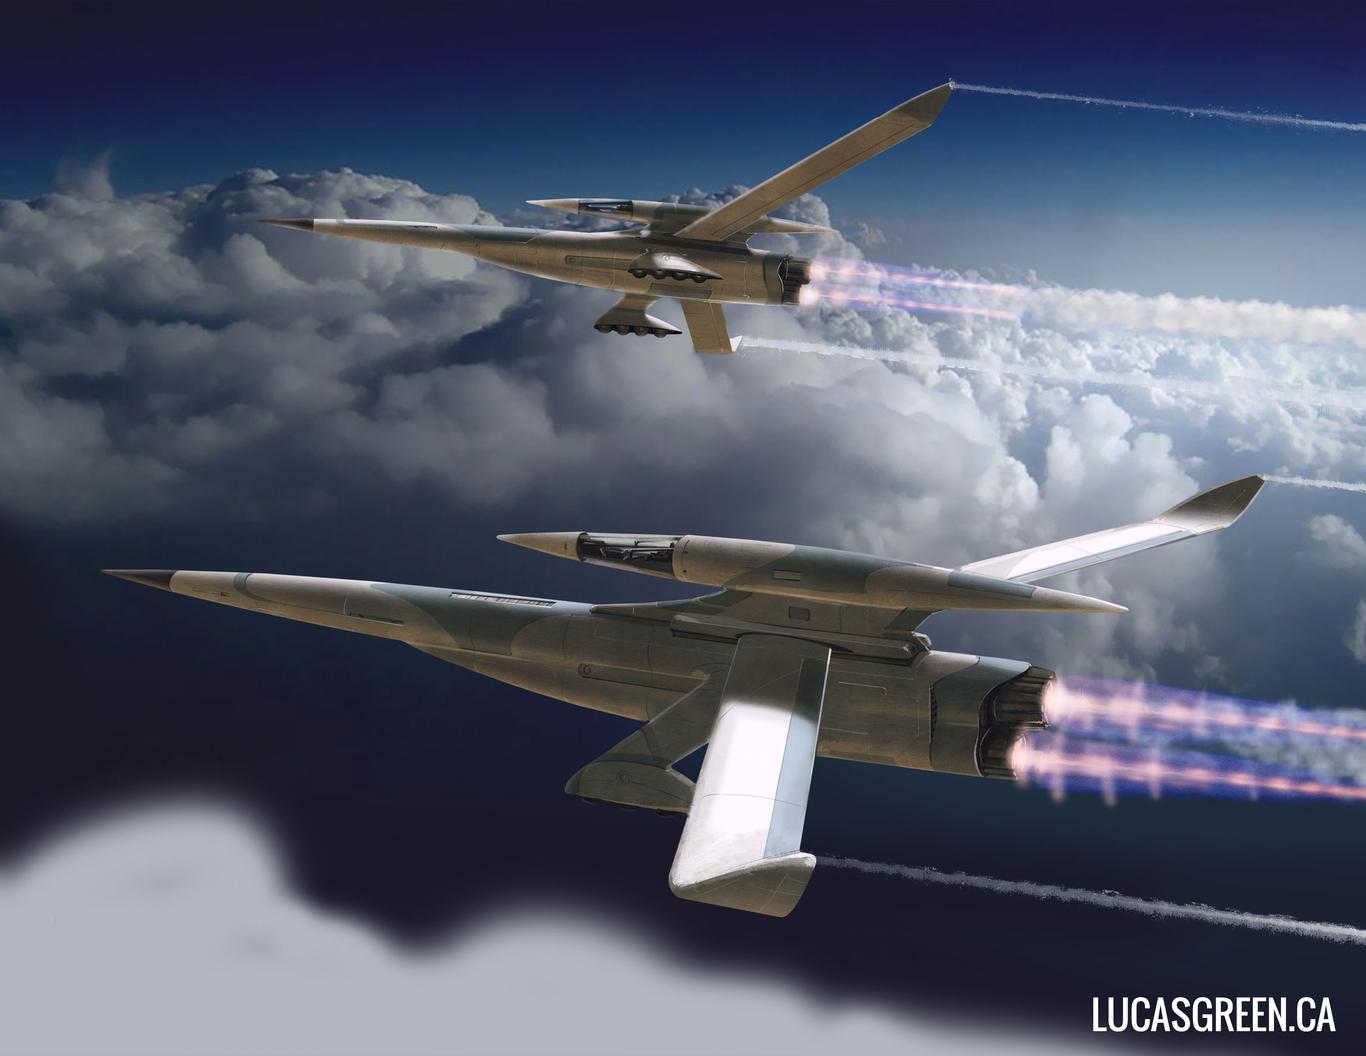 Lucasgreen rocketplane 1 bbcc164e c03j